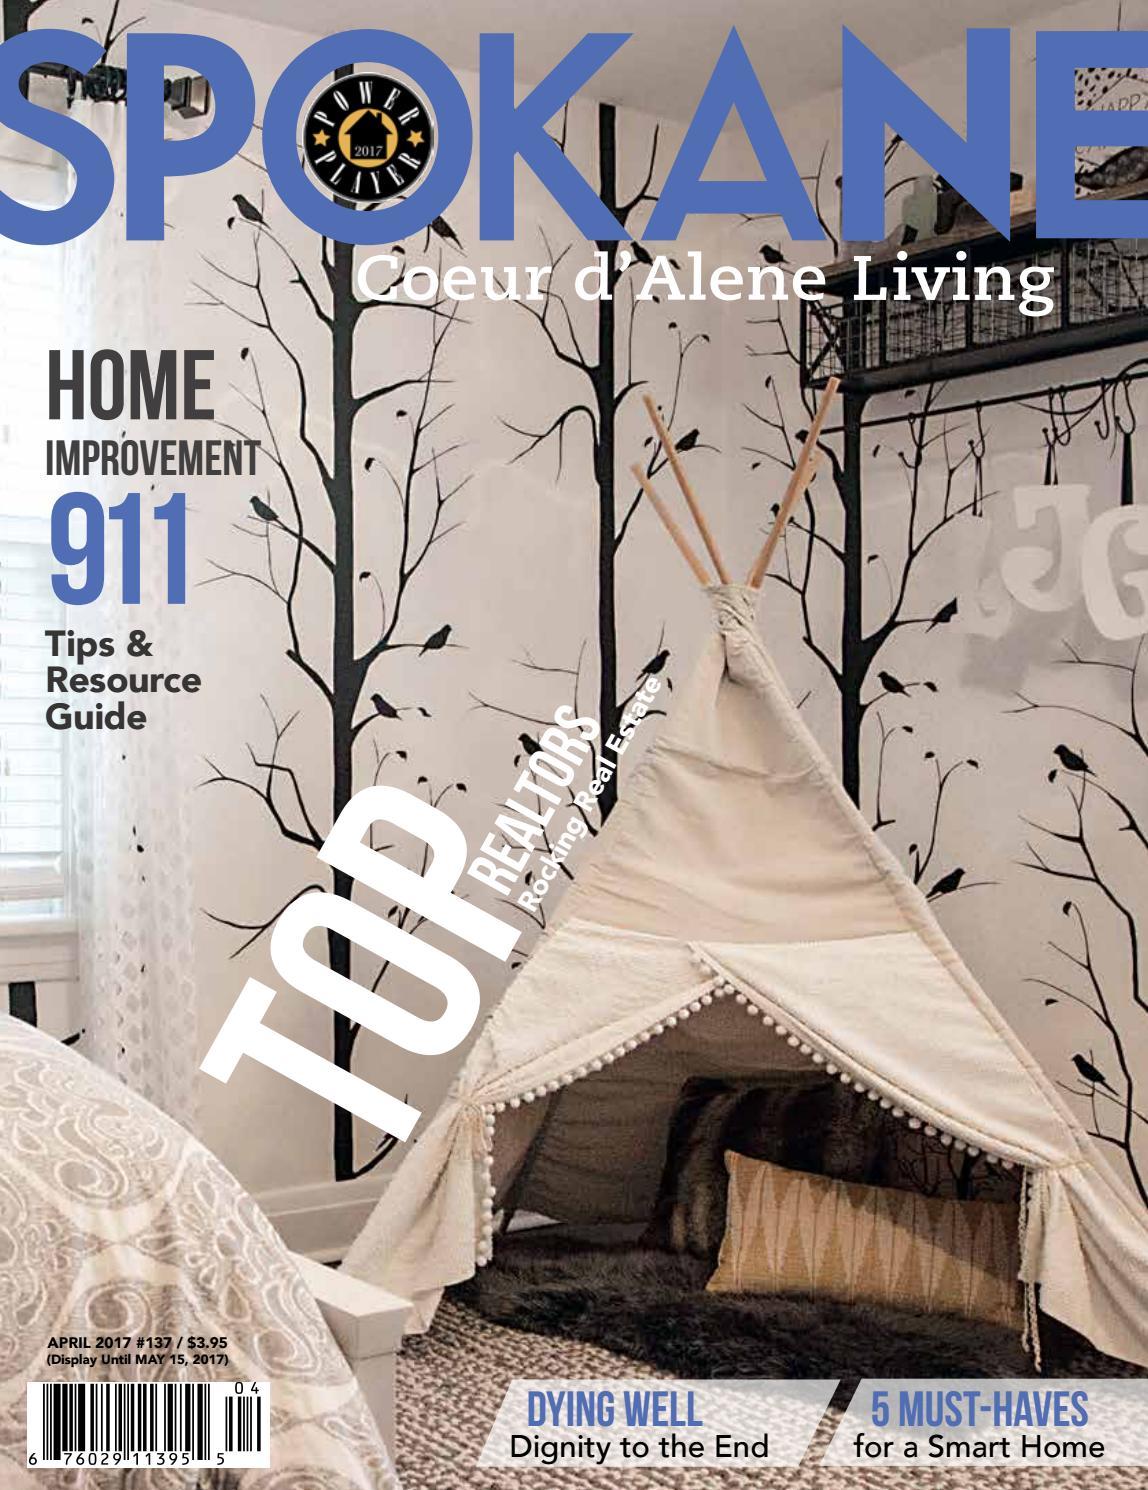 7b90ee7a5168 Spokane CDA Living April 2017  137 by Spokane magazine - issuu